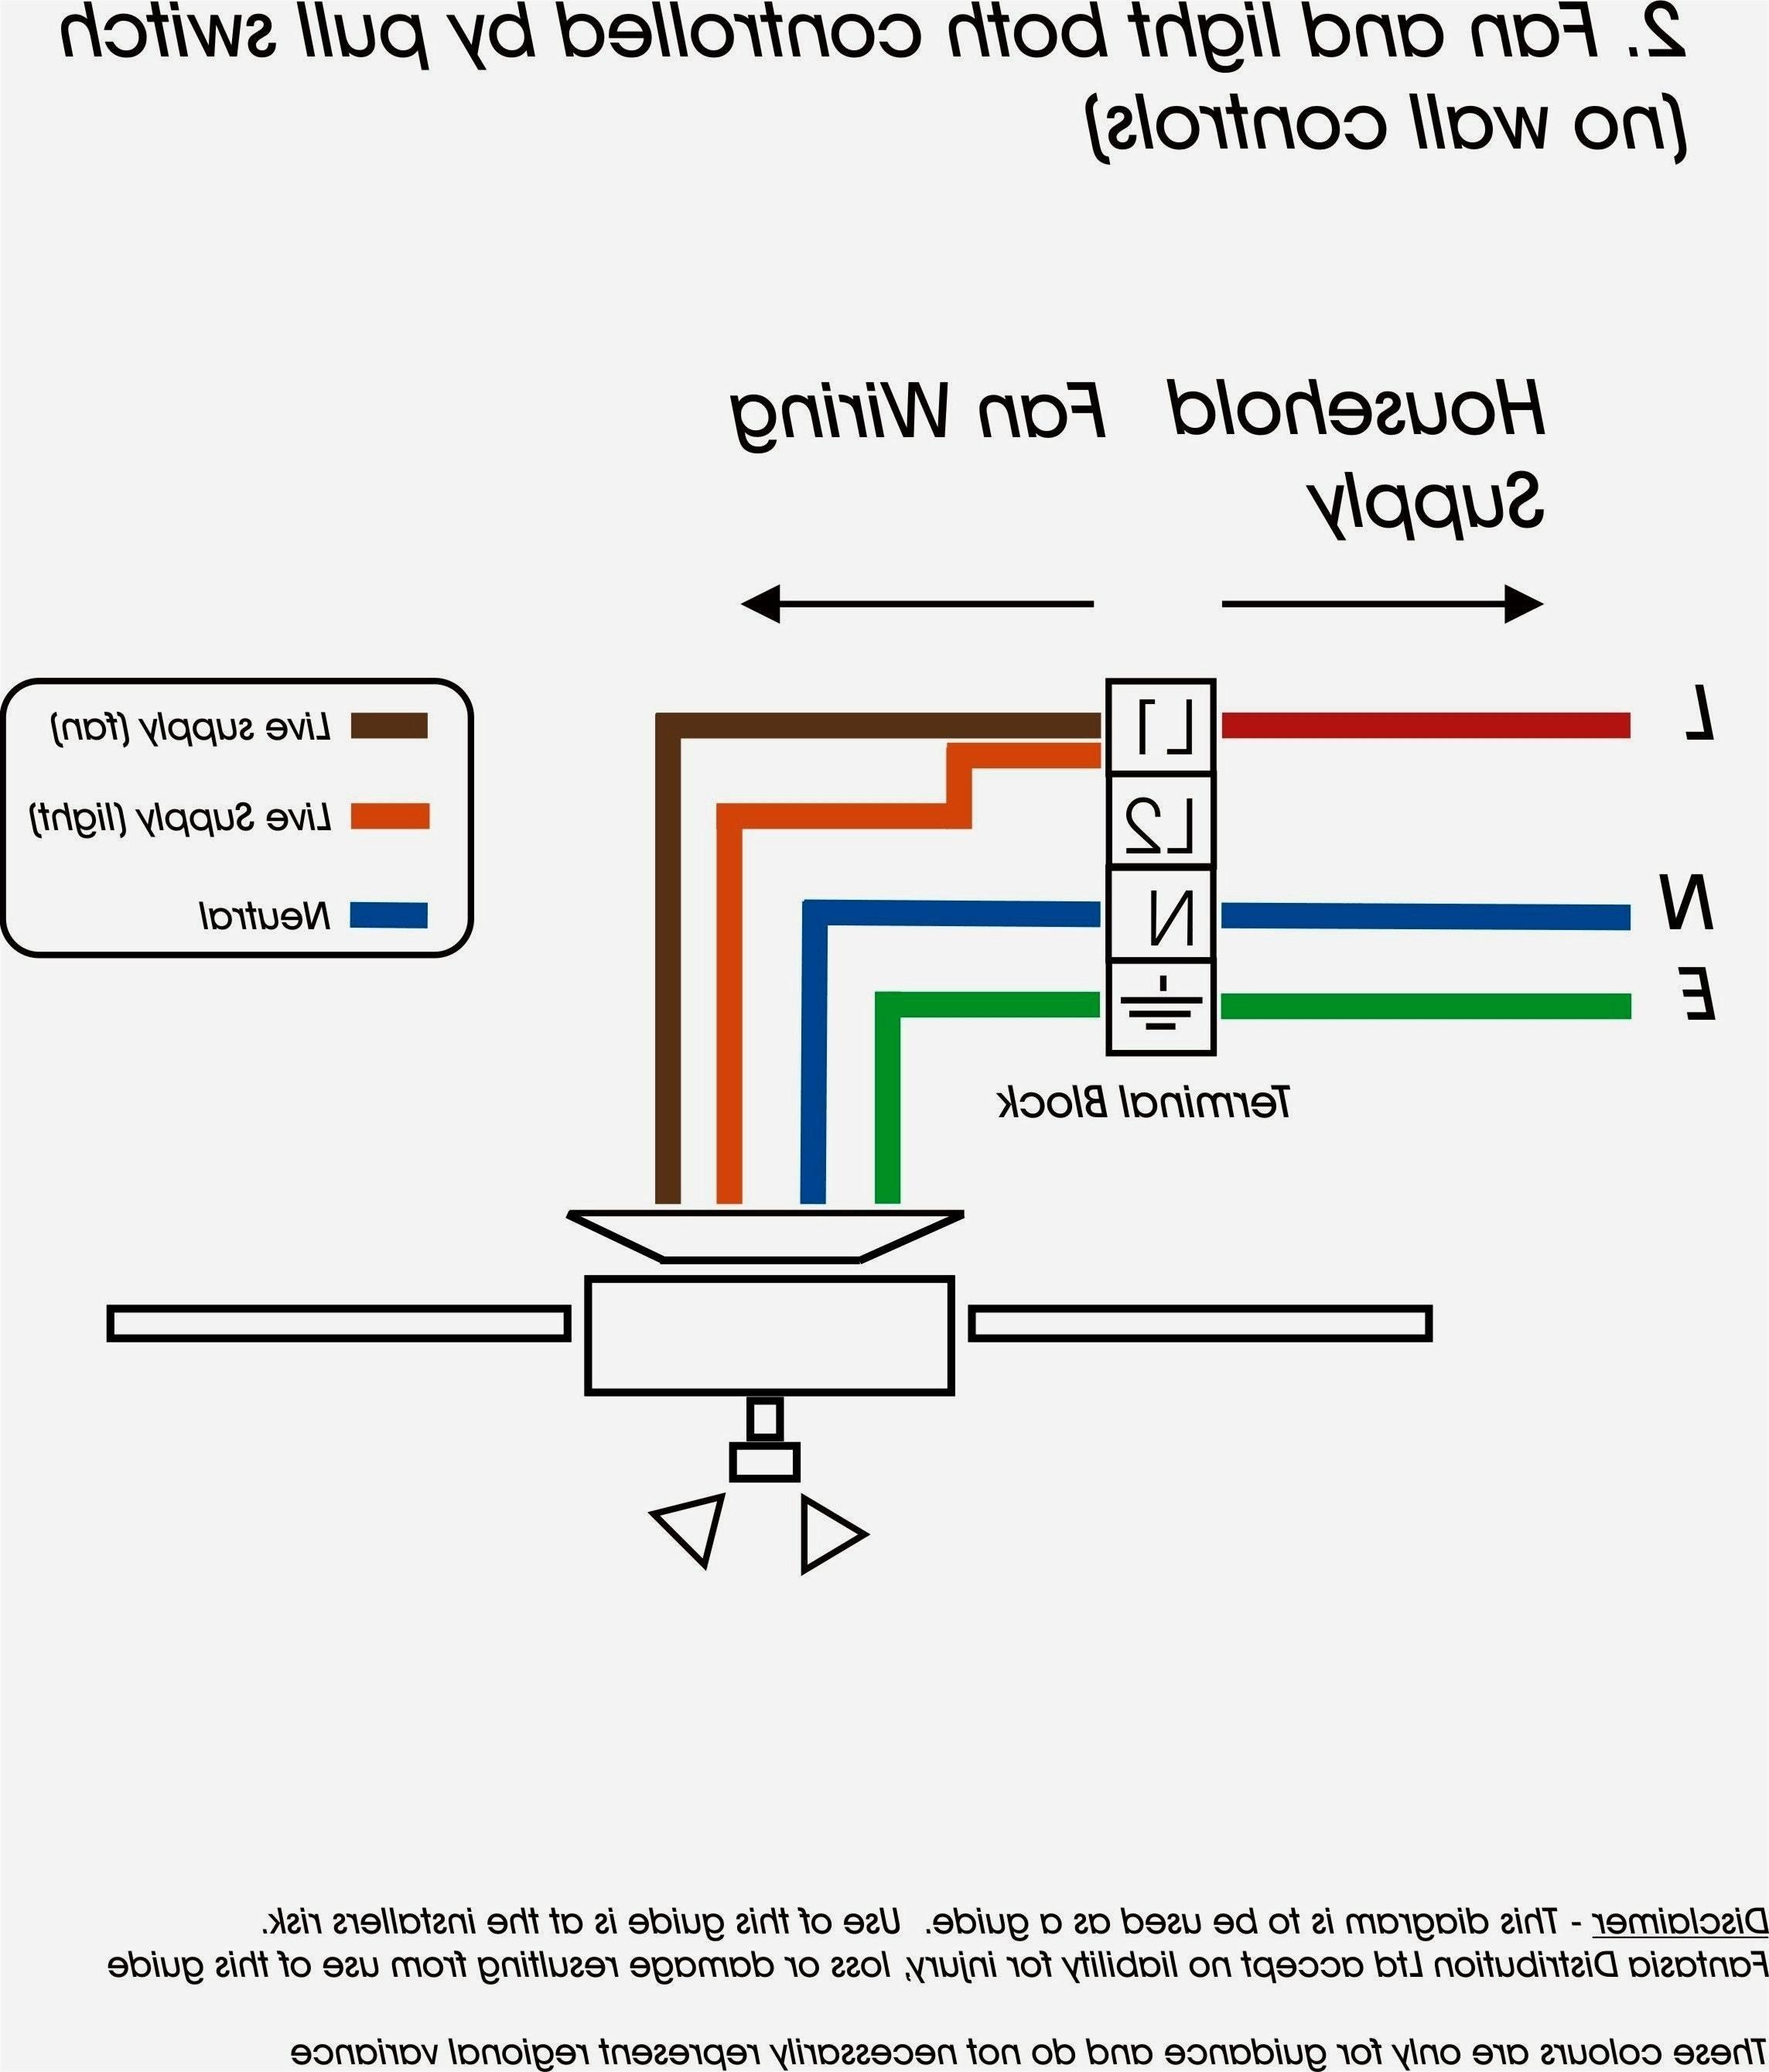 4 Stroke Dirt Bike Engine Diagram C4a8c6 4 Wire Motor Diagram Of 4 Stroke Dirt Bike Engine Diagram